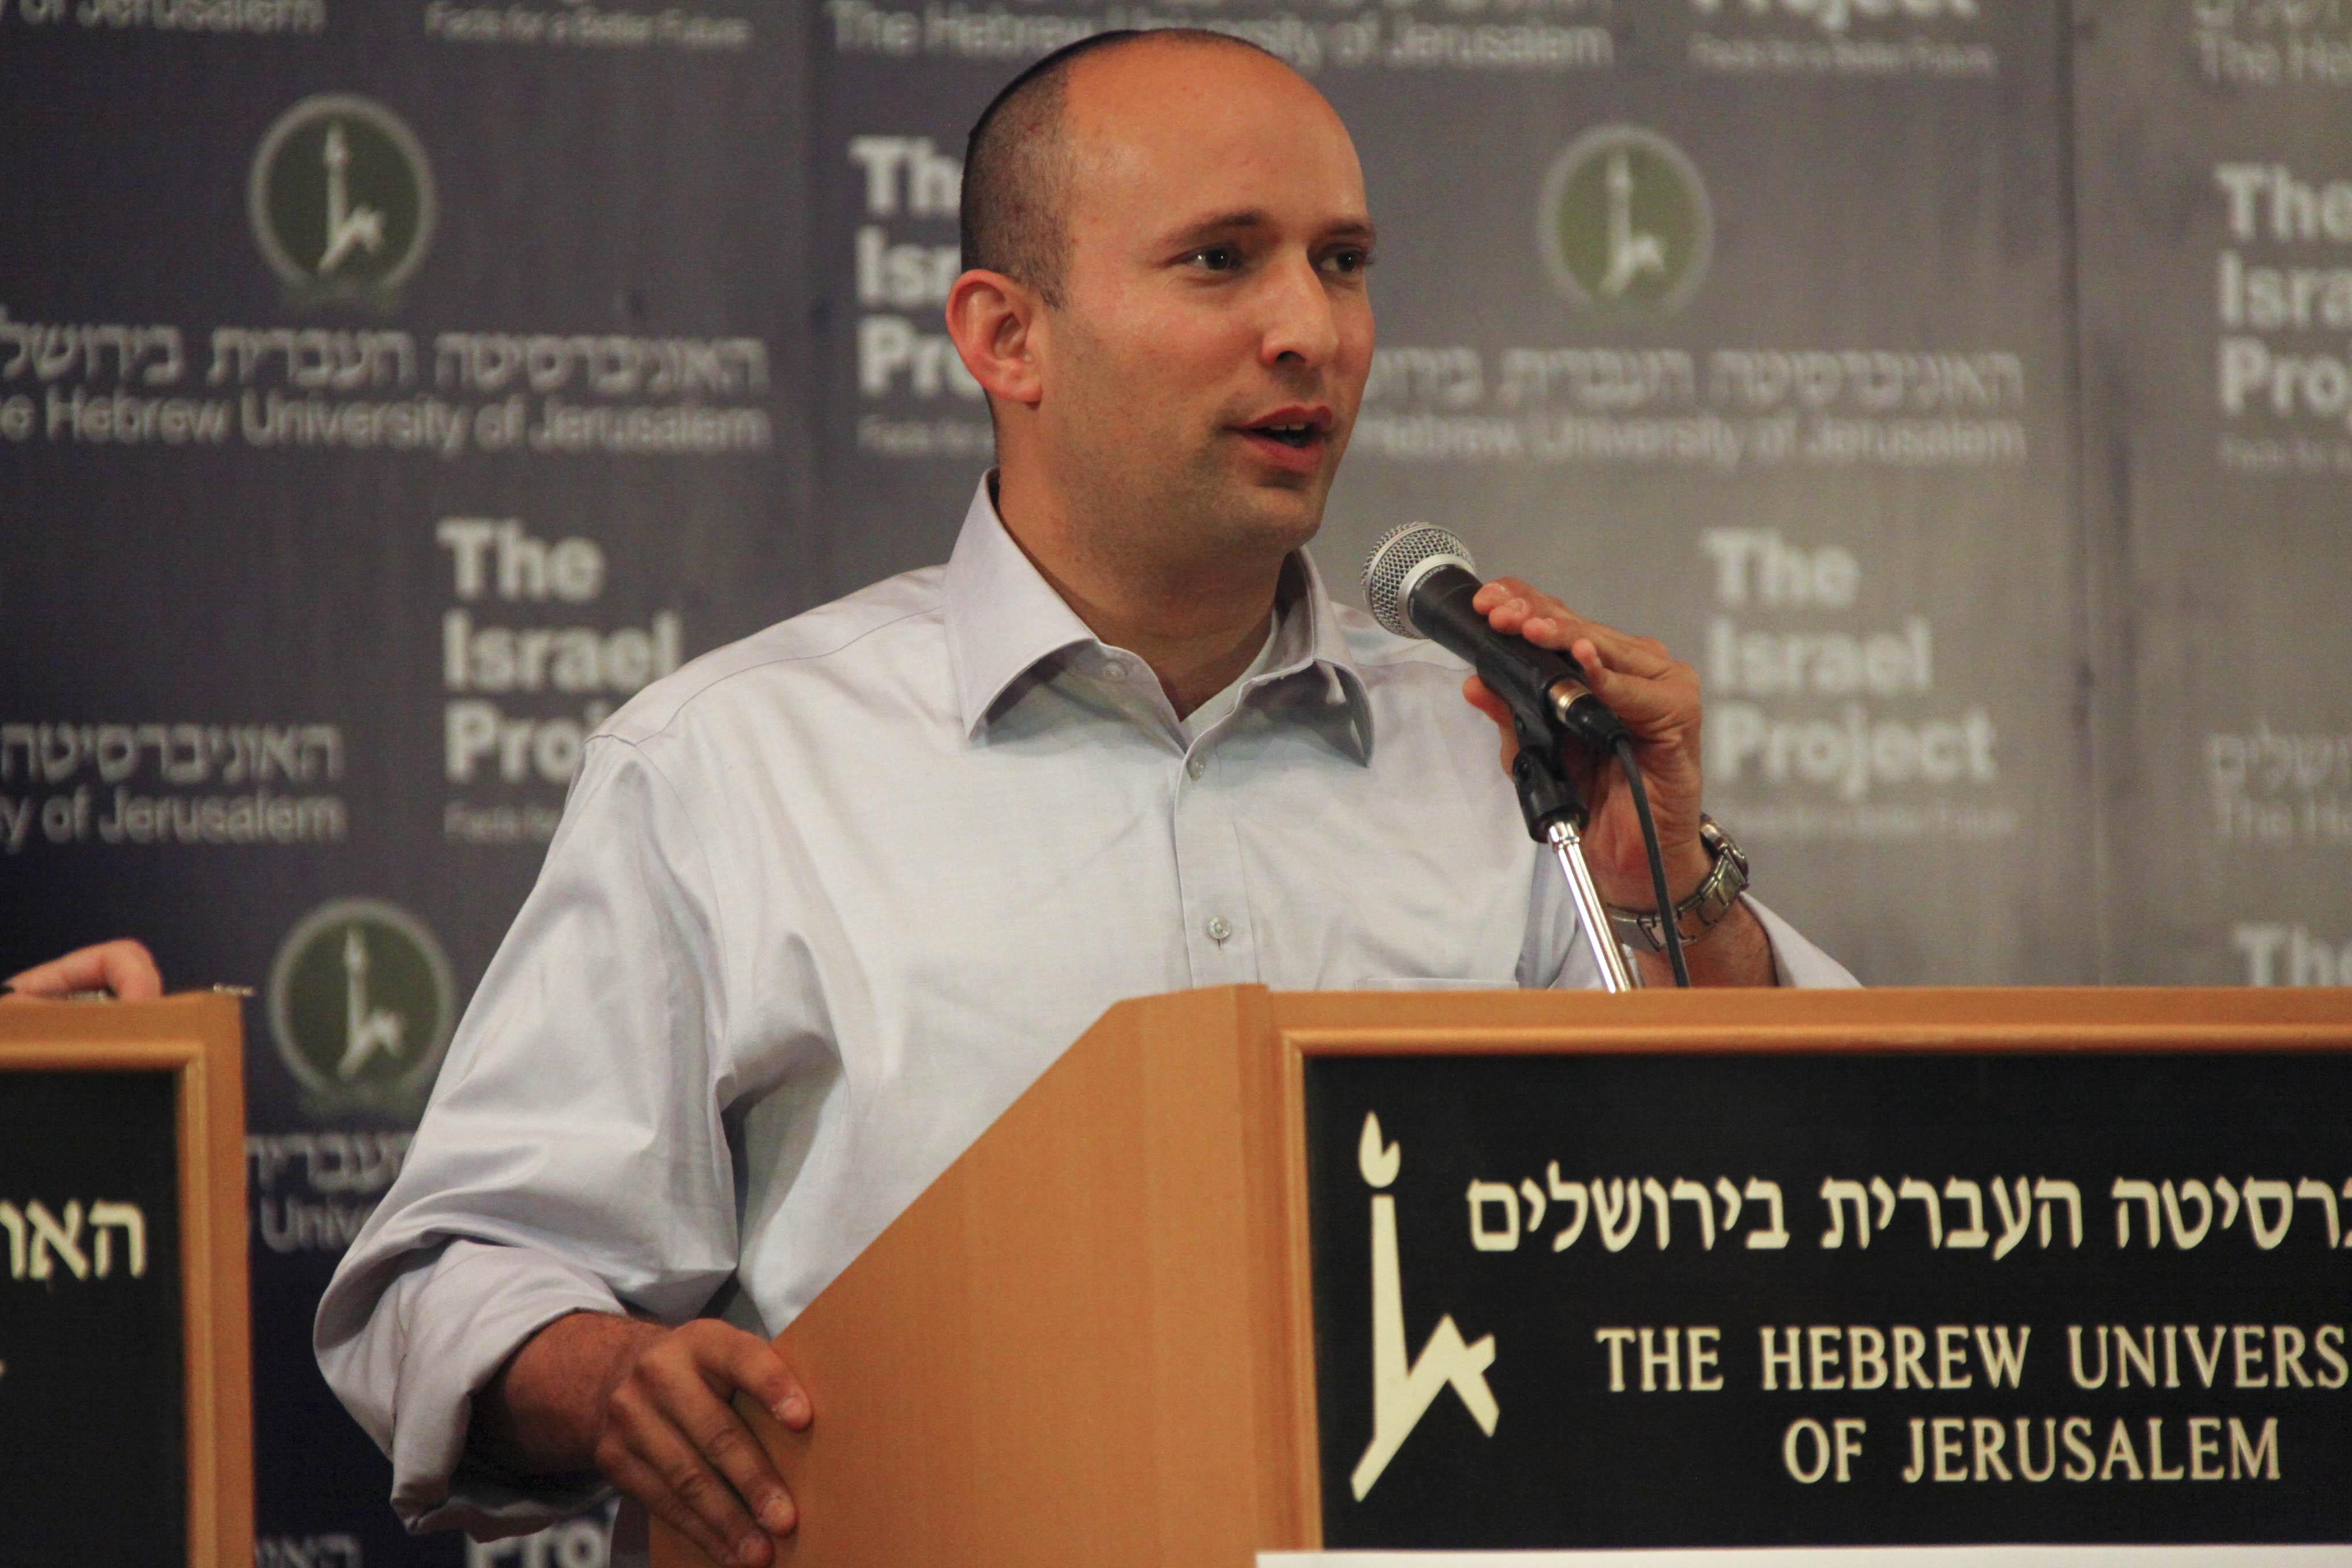 File:Naftali Bennett HUJI Election Debate 2.jpg - Wikimedia Commons